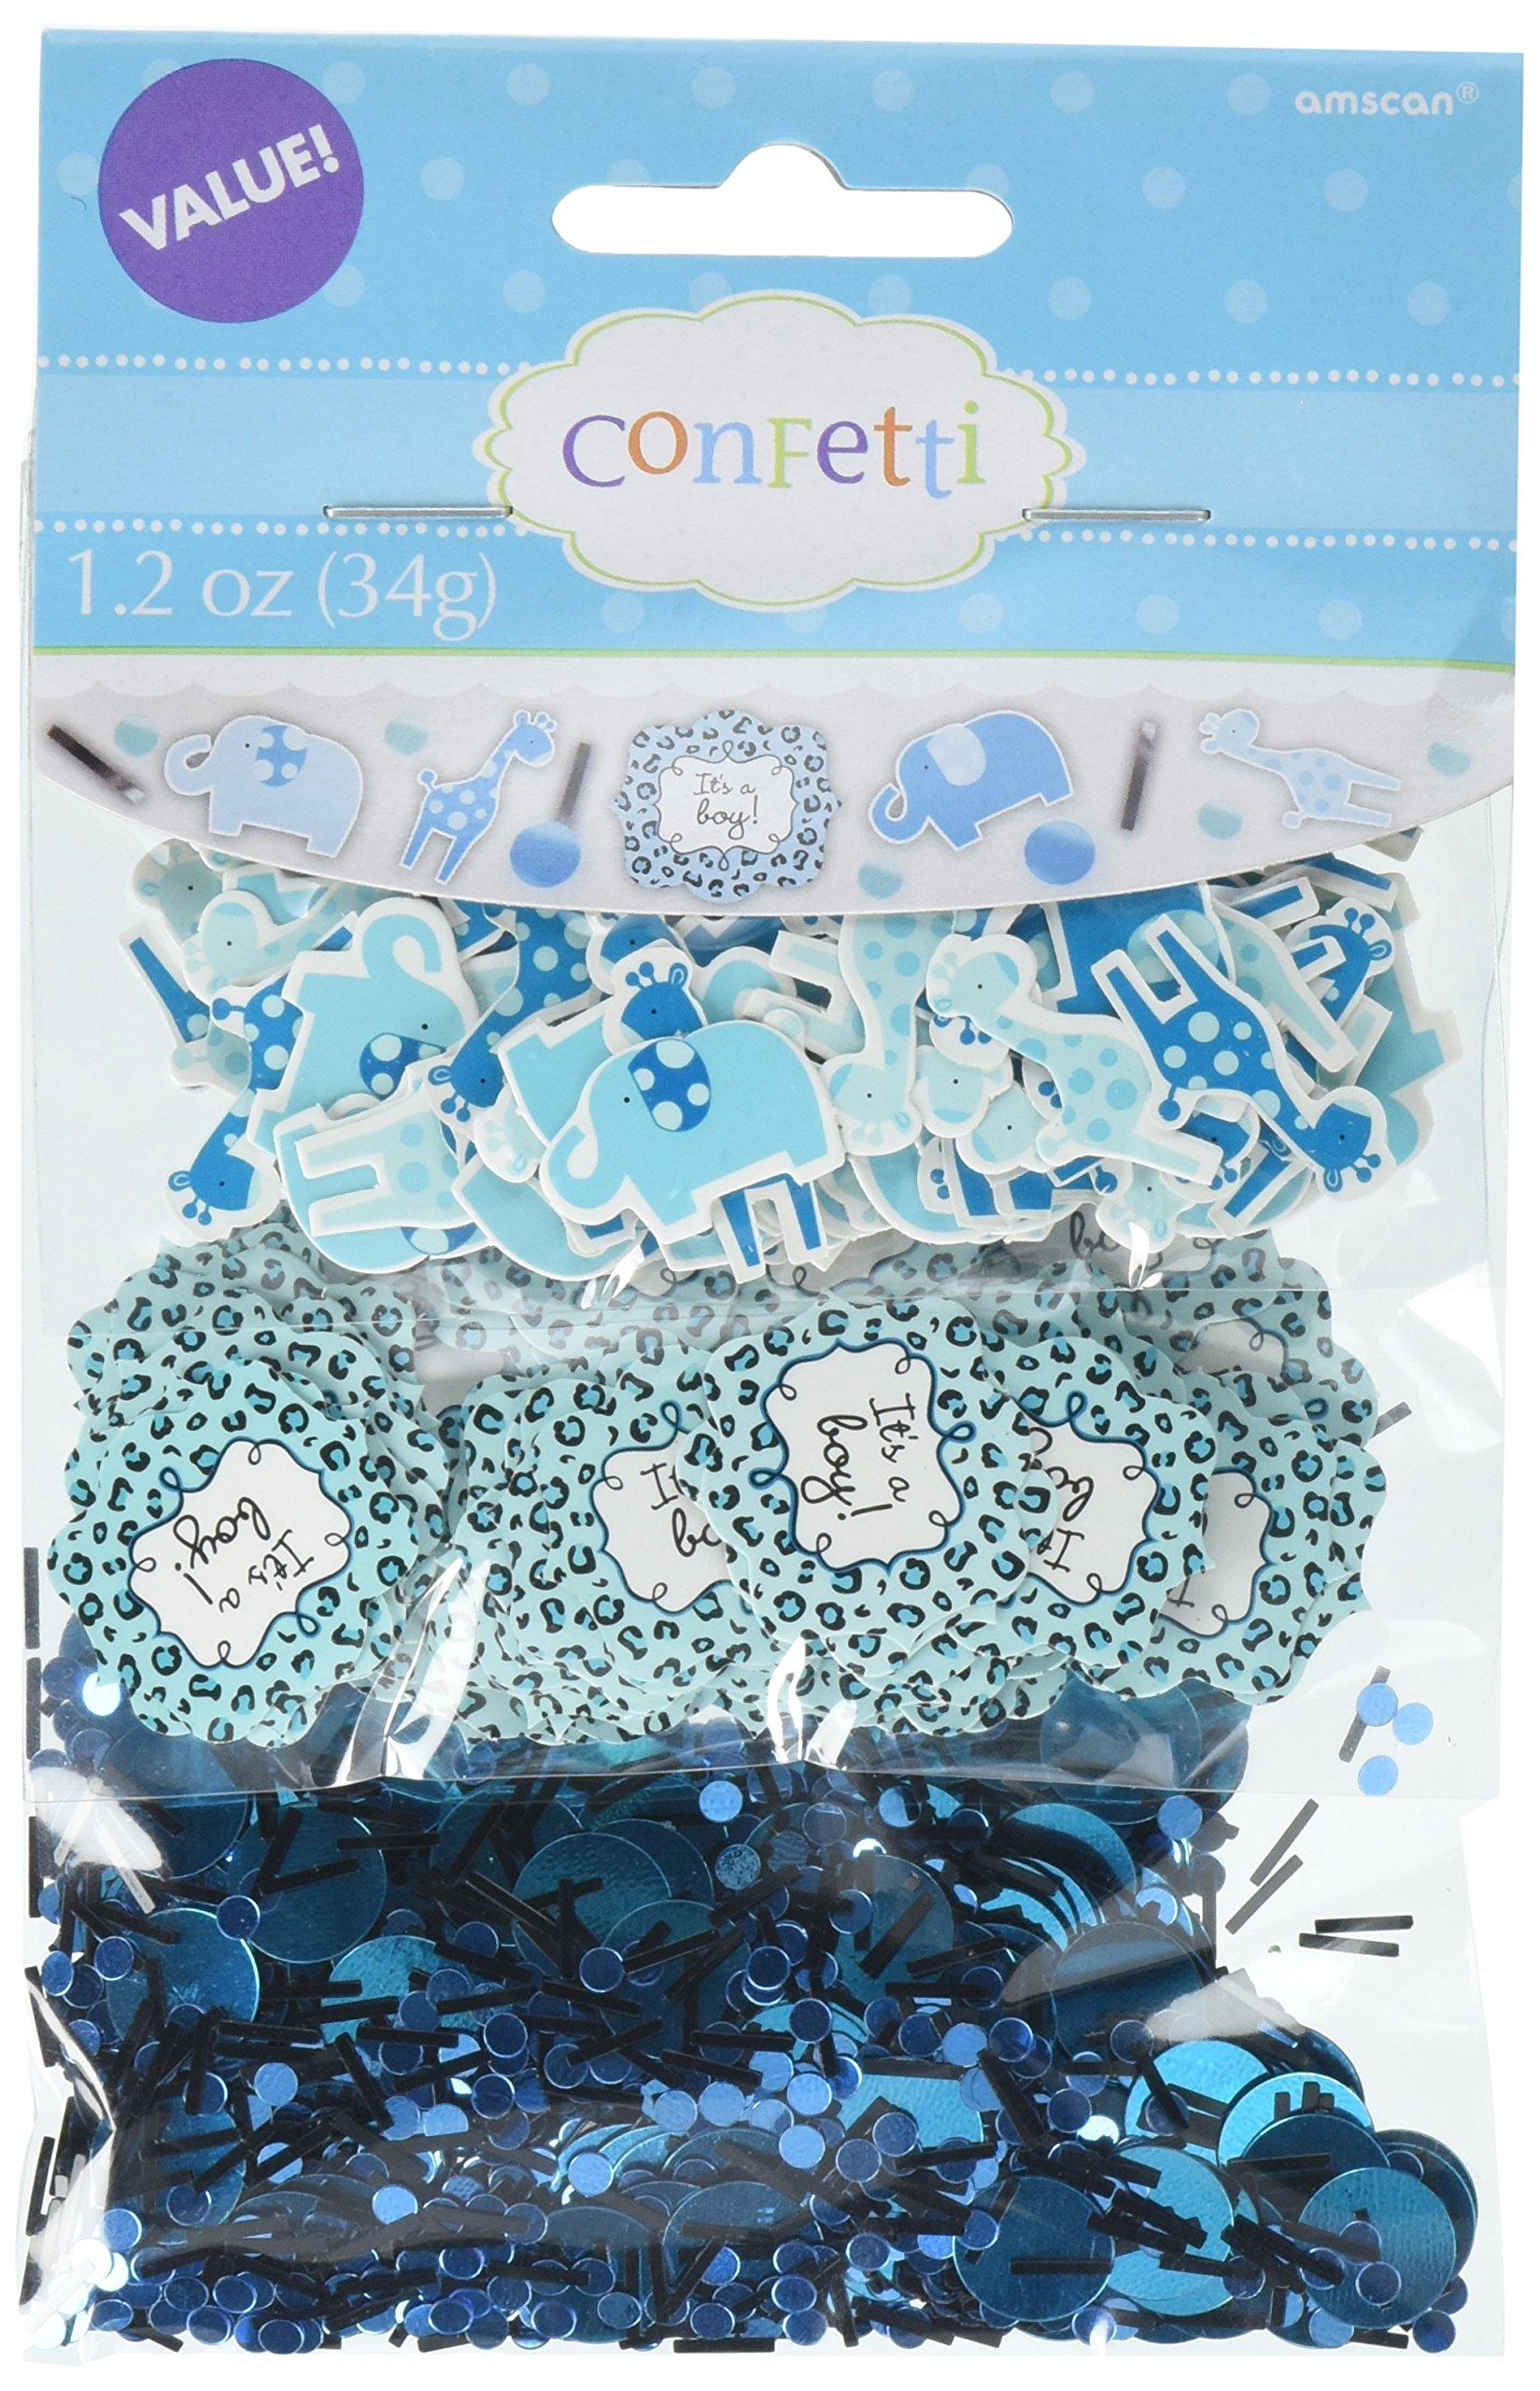 Amscan Sweet Safari Boy Baby Shower Paper Confetti Room Decoration Party Supplies (12 Piece), Blue, 1.2 Oz